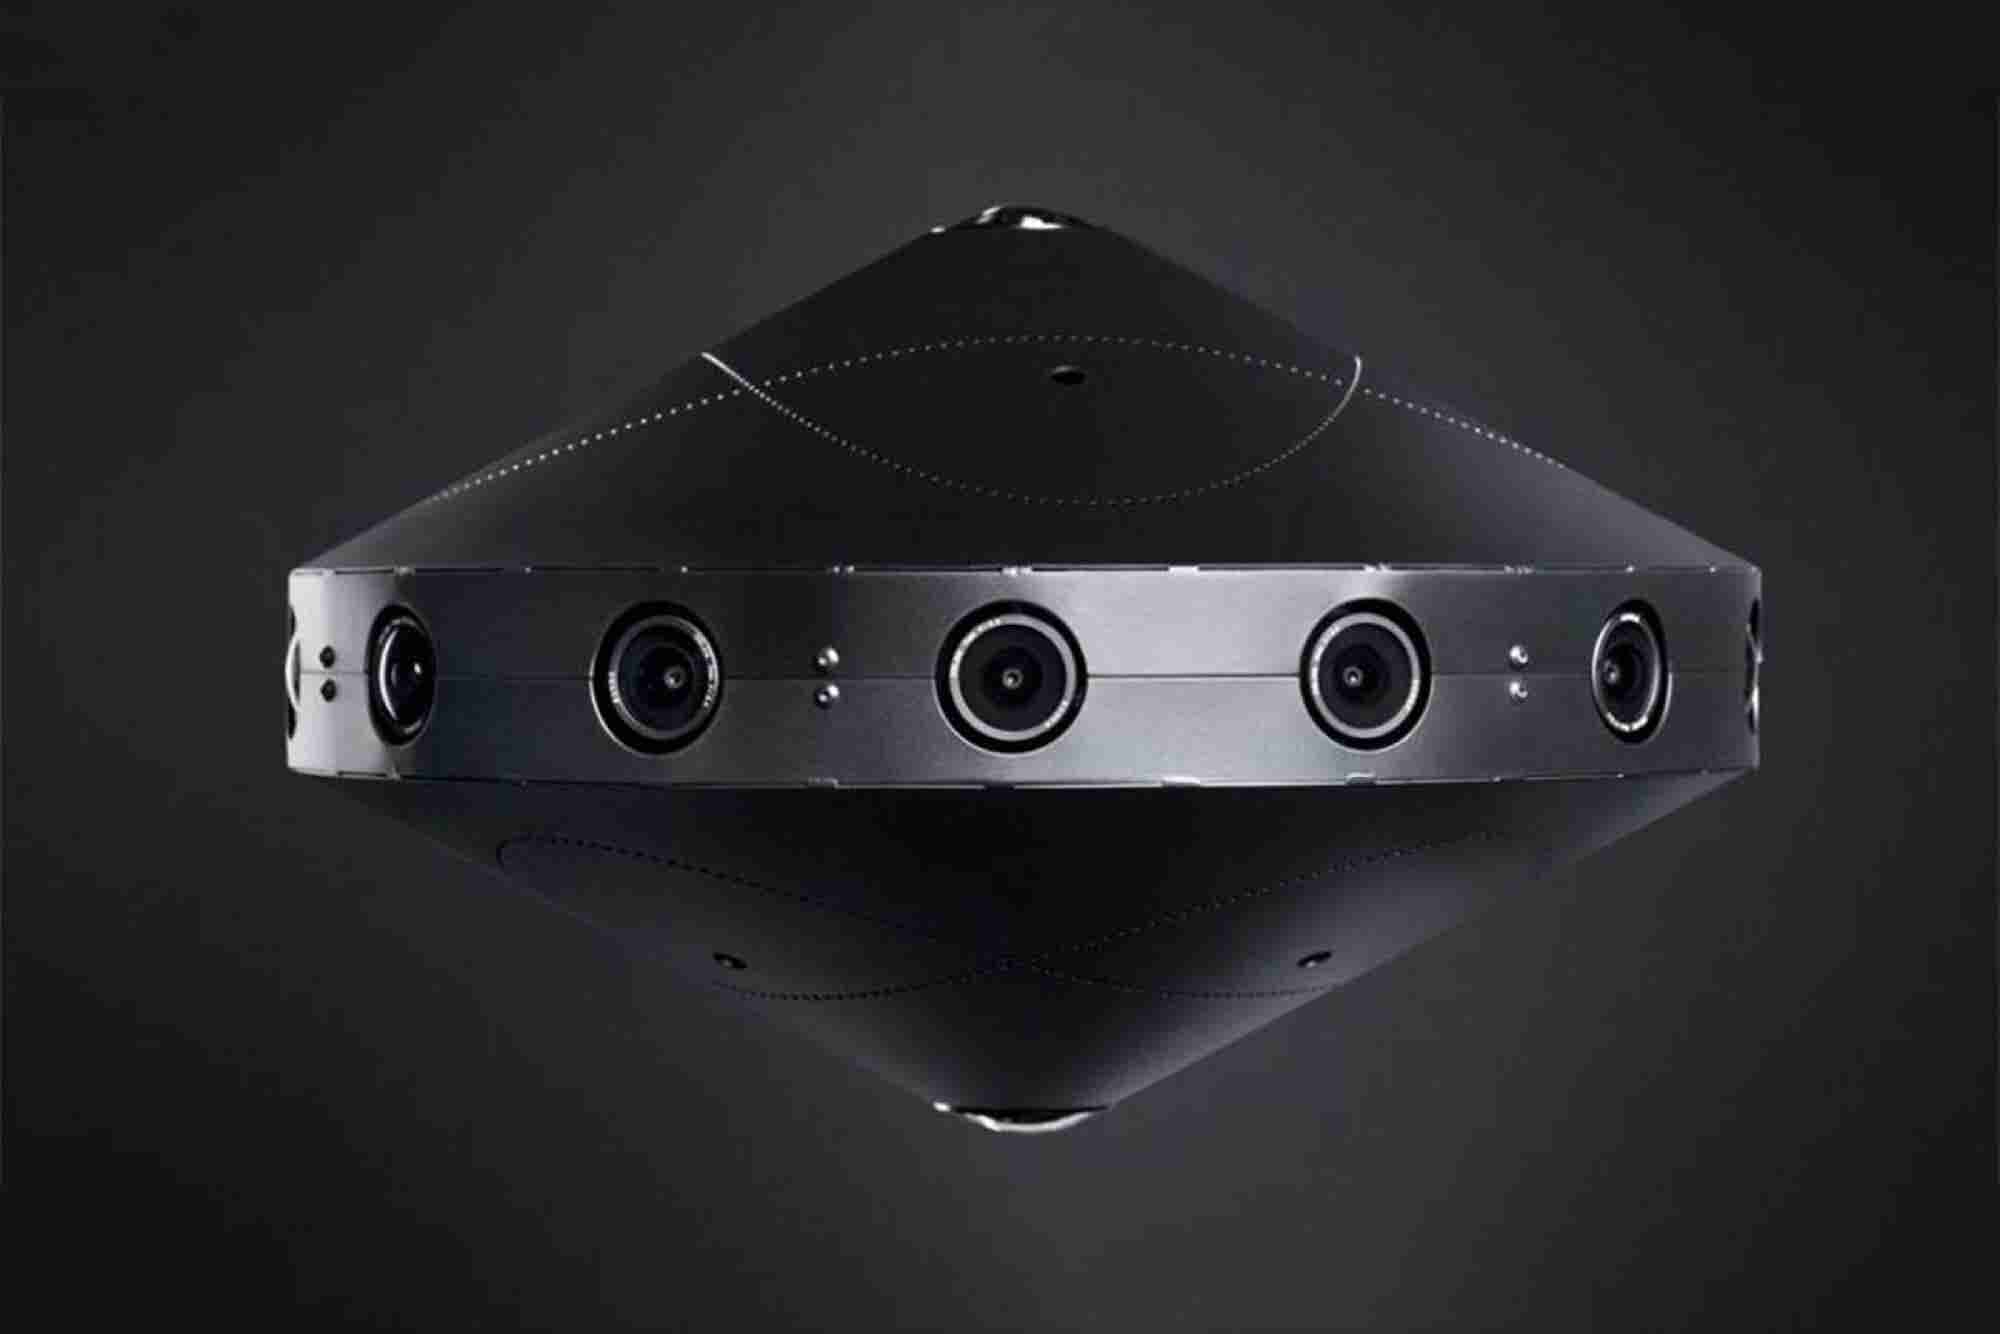 Facebook Gives Away 360-Degree Camera Design